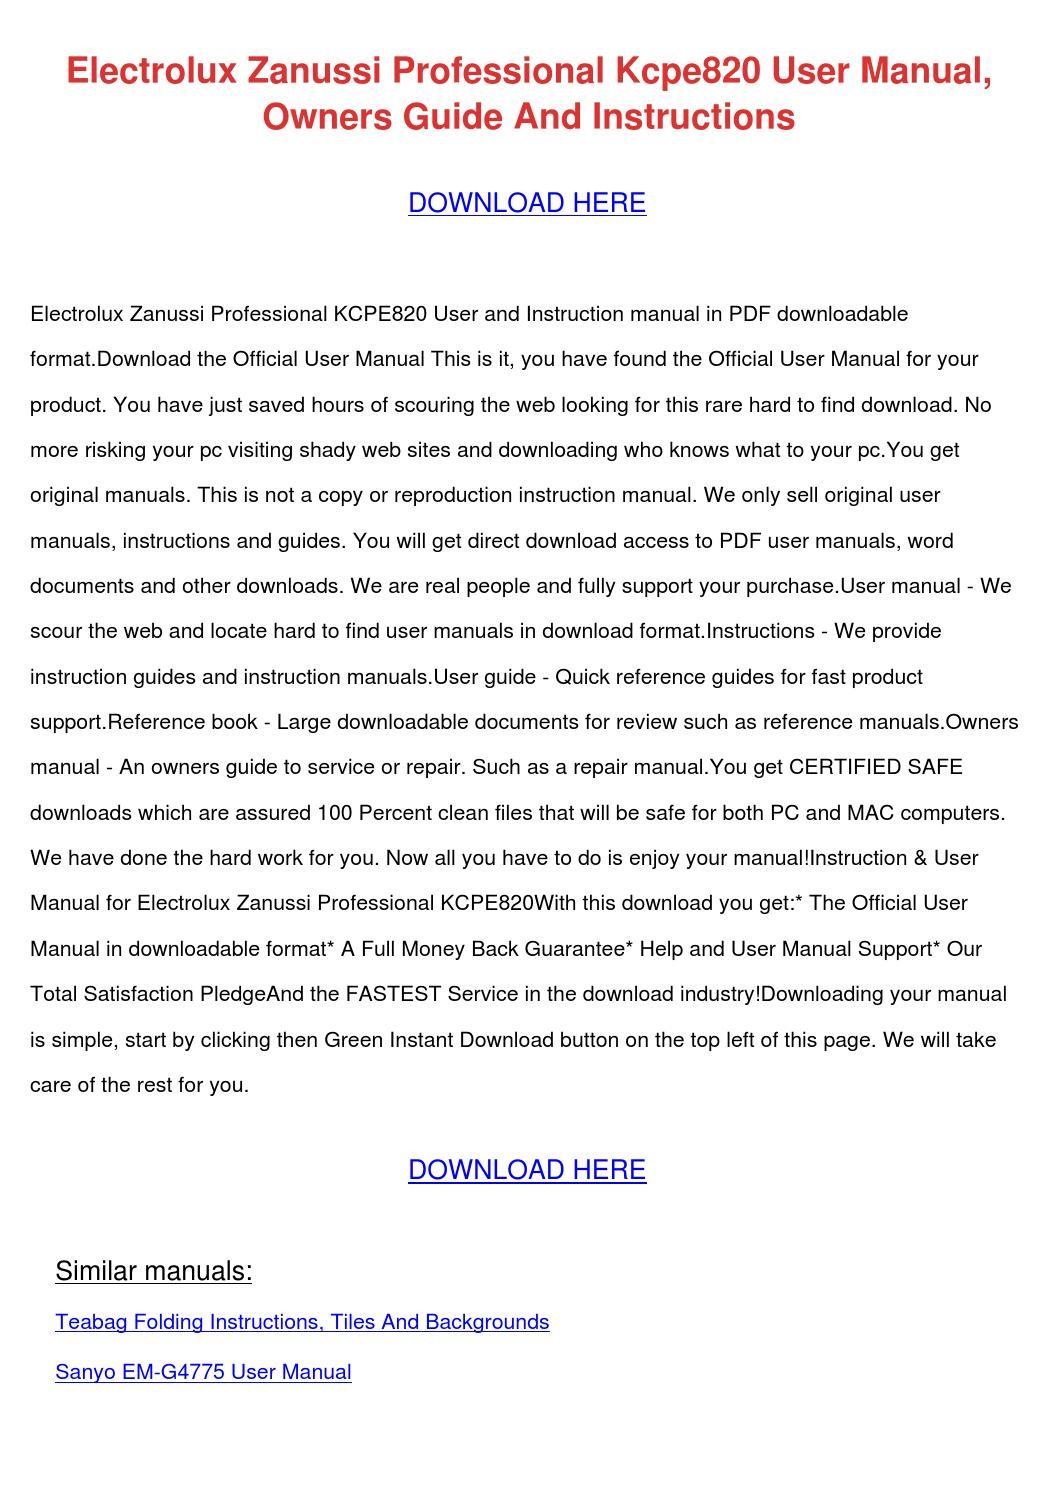 Electrolux Zanussi Professional Kcpe820 User by LeannaLafferty - issuu